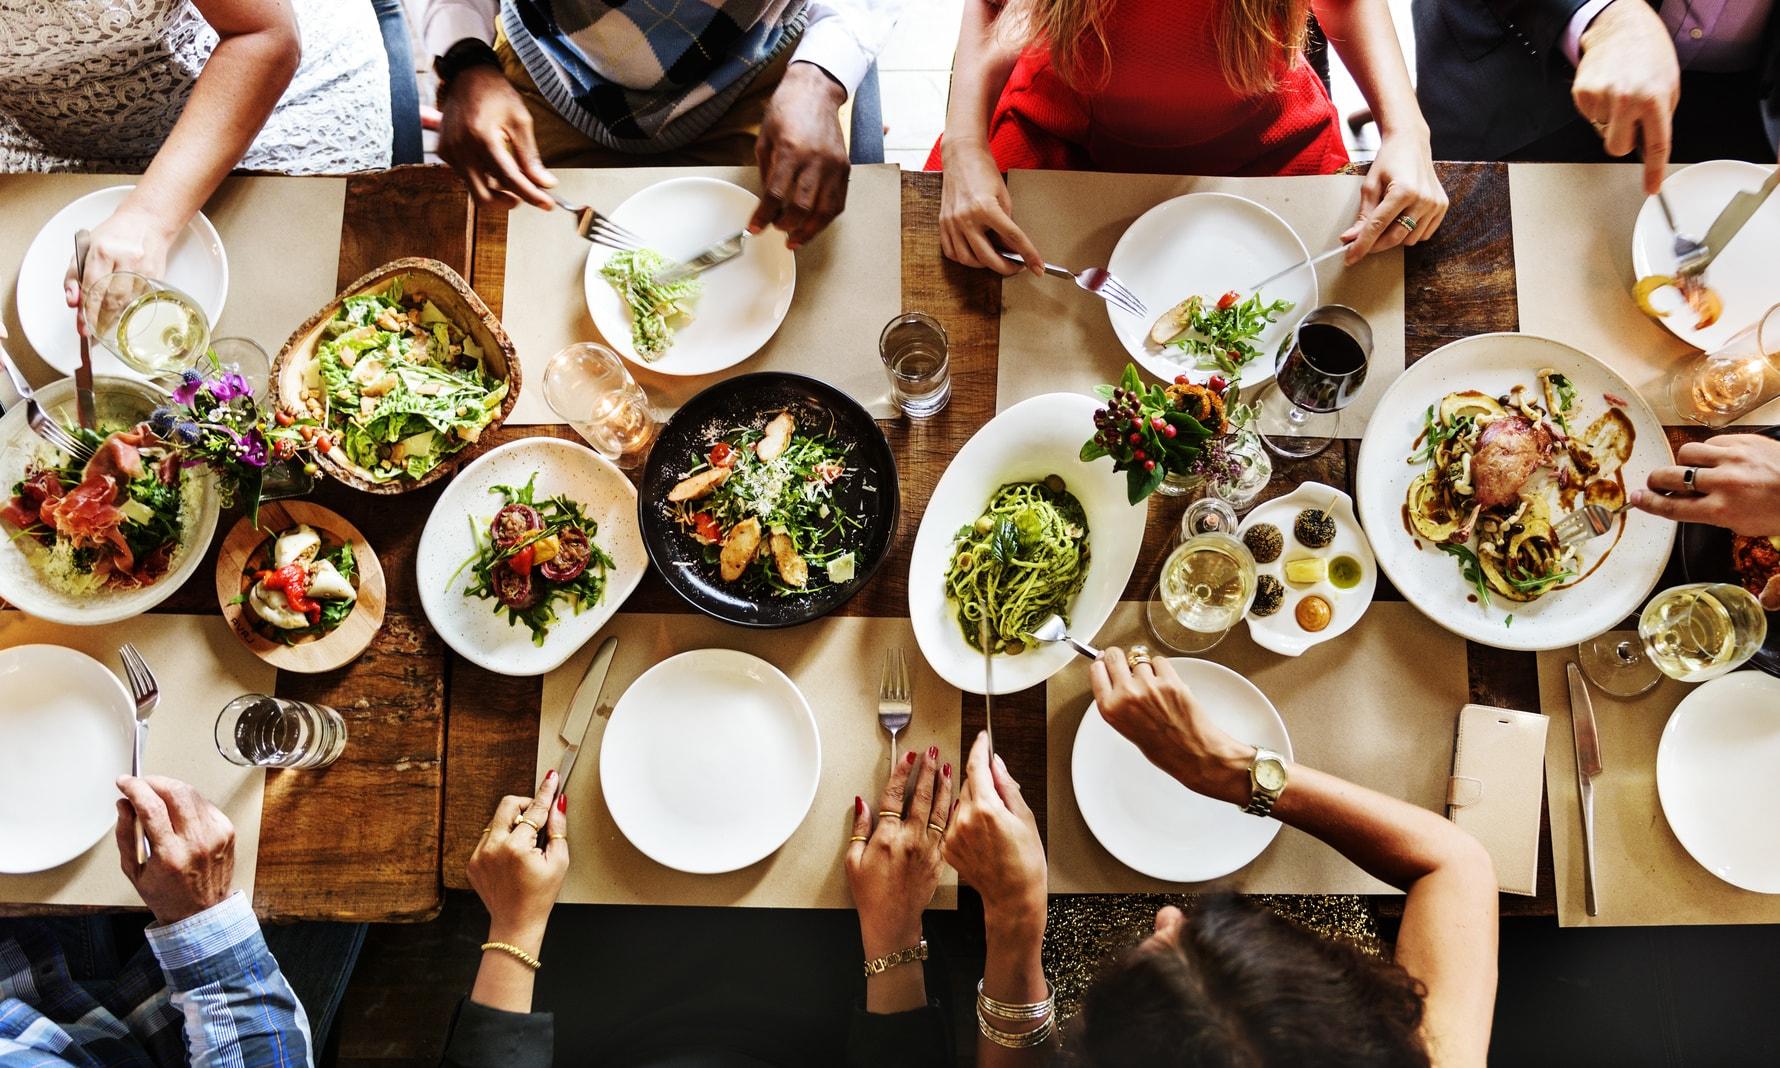 Mahlzeiten - Appetit anregen- Philip Baum